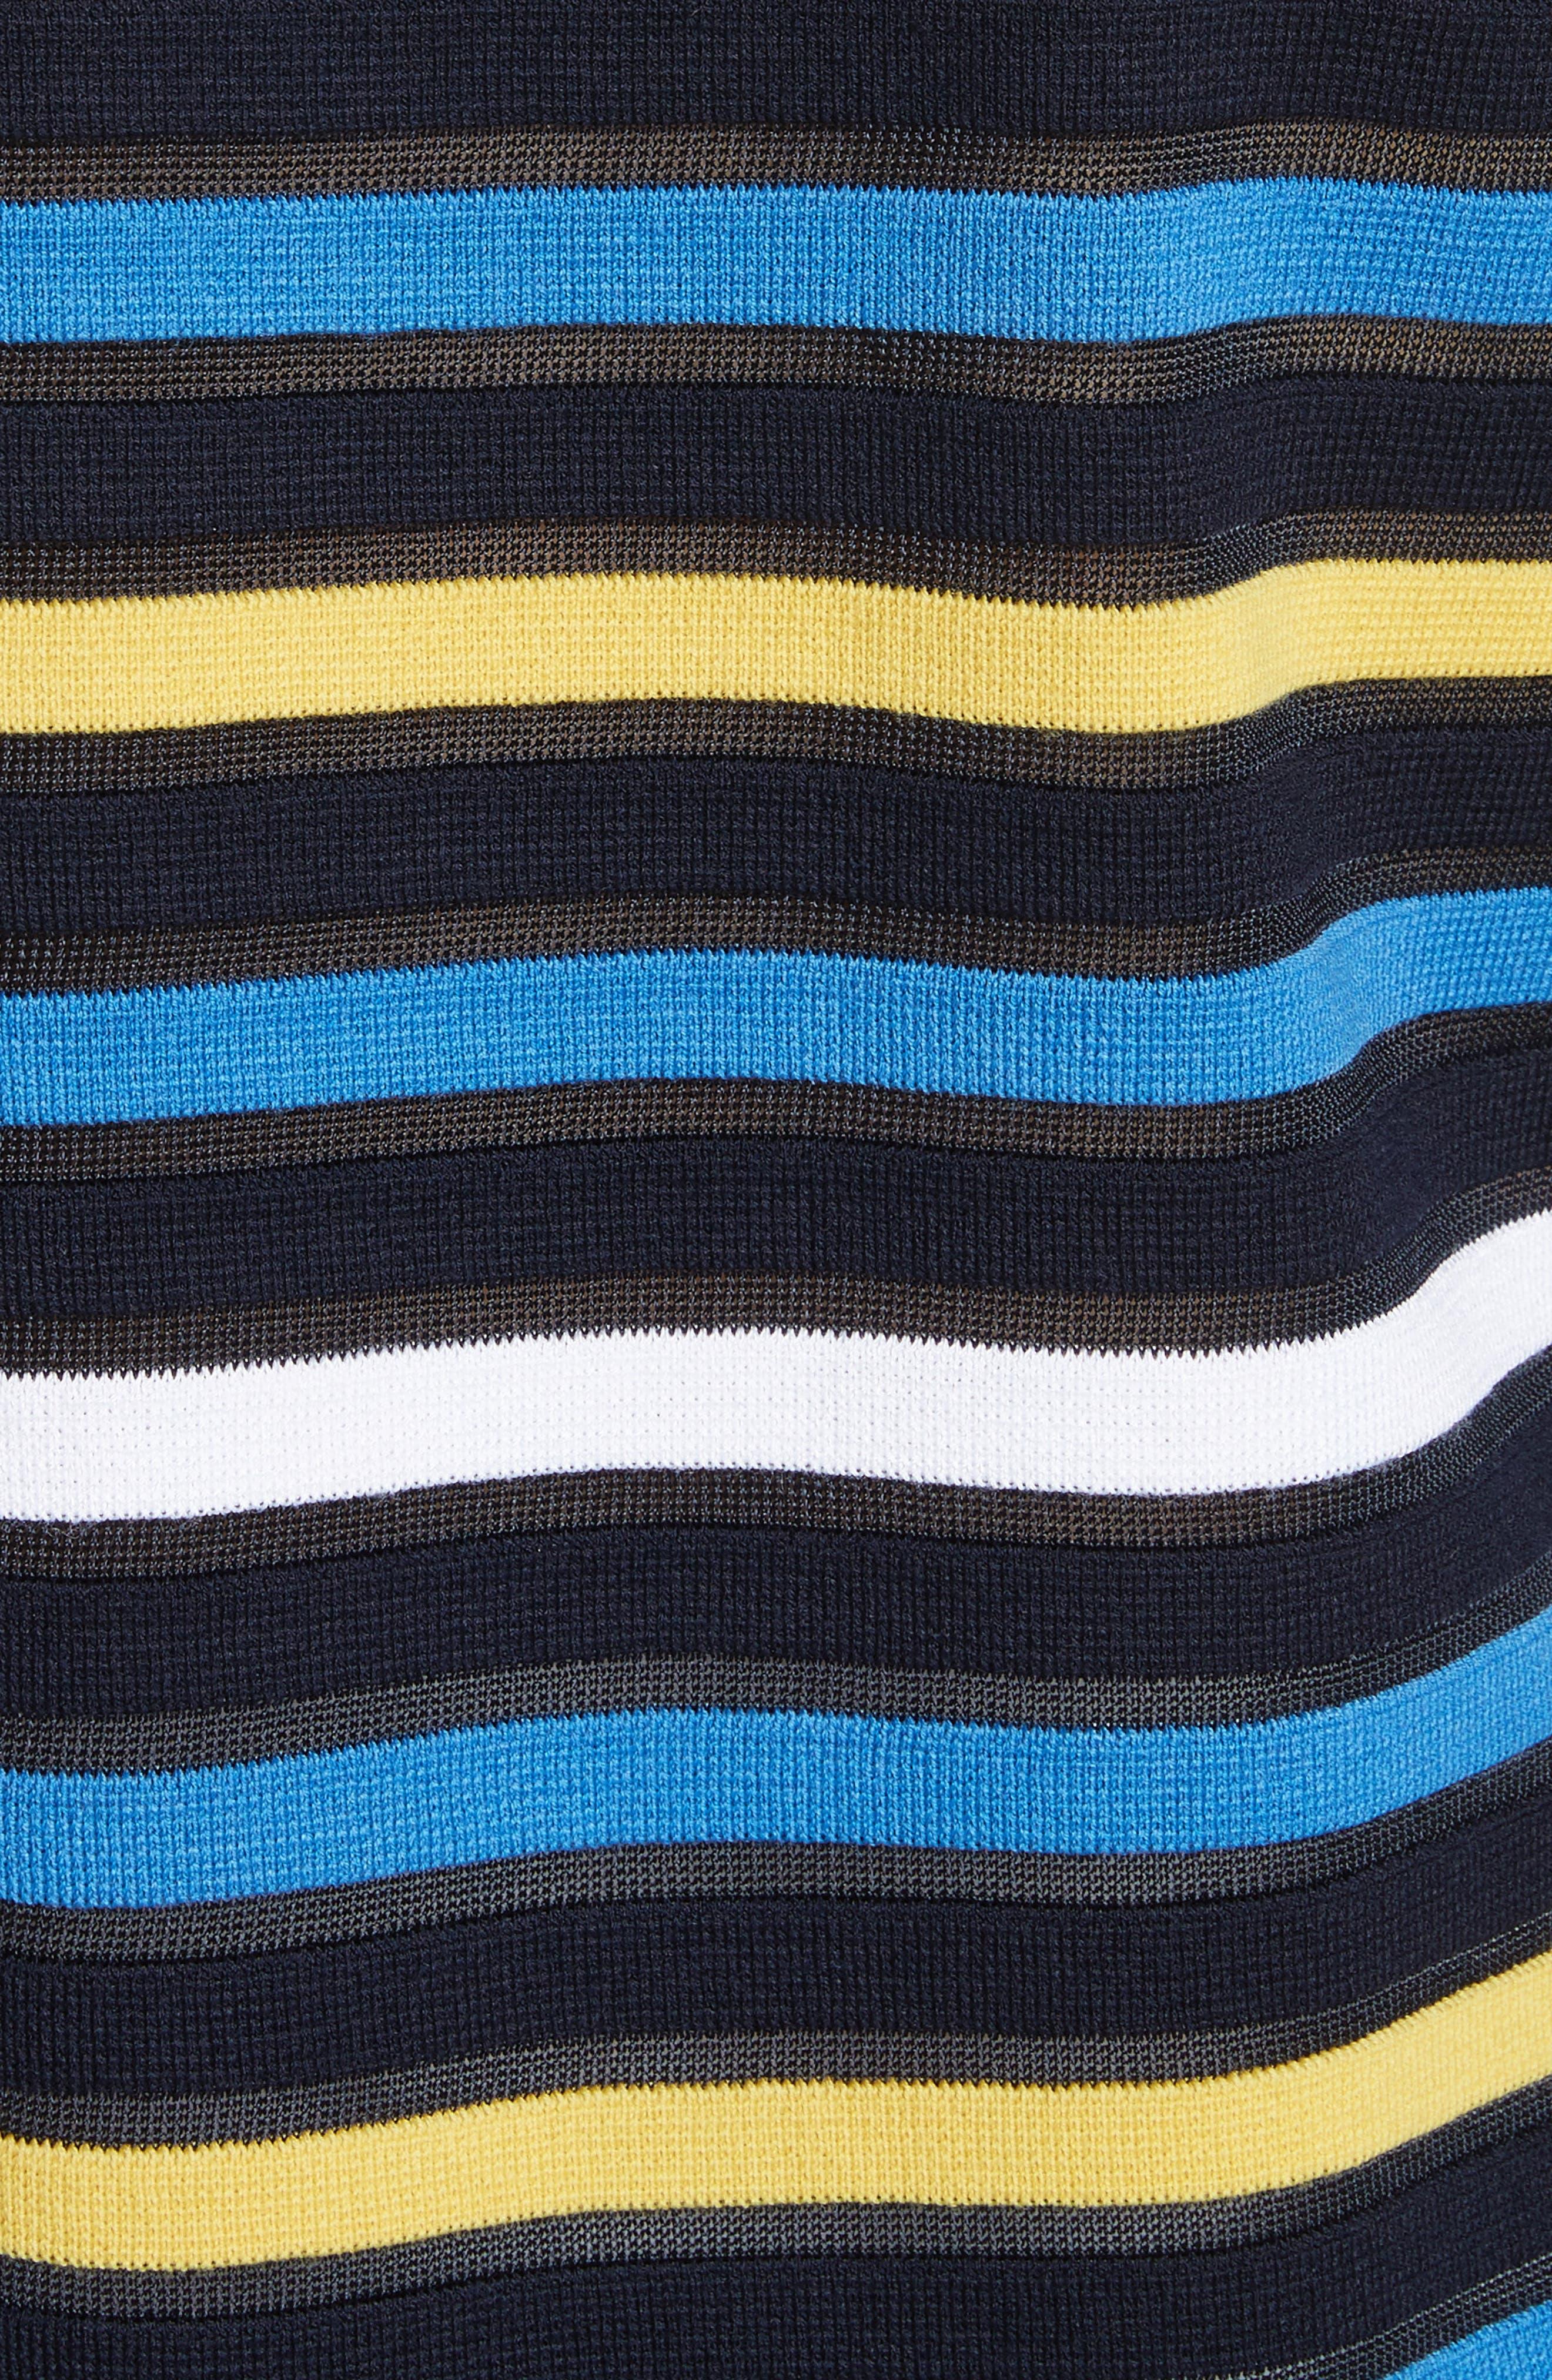 Ombré Stripe Sweater,                             Alternate thumbnail 5, color,                             Navy Multi